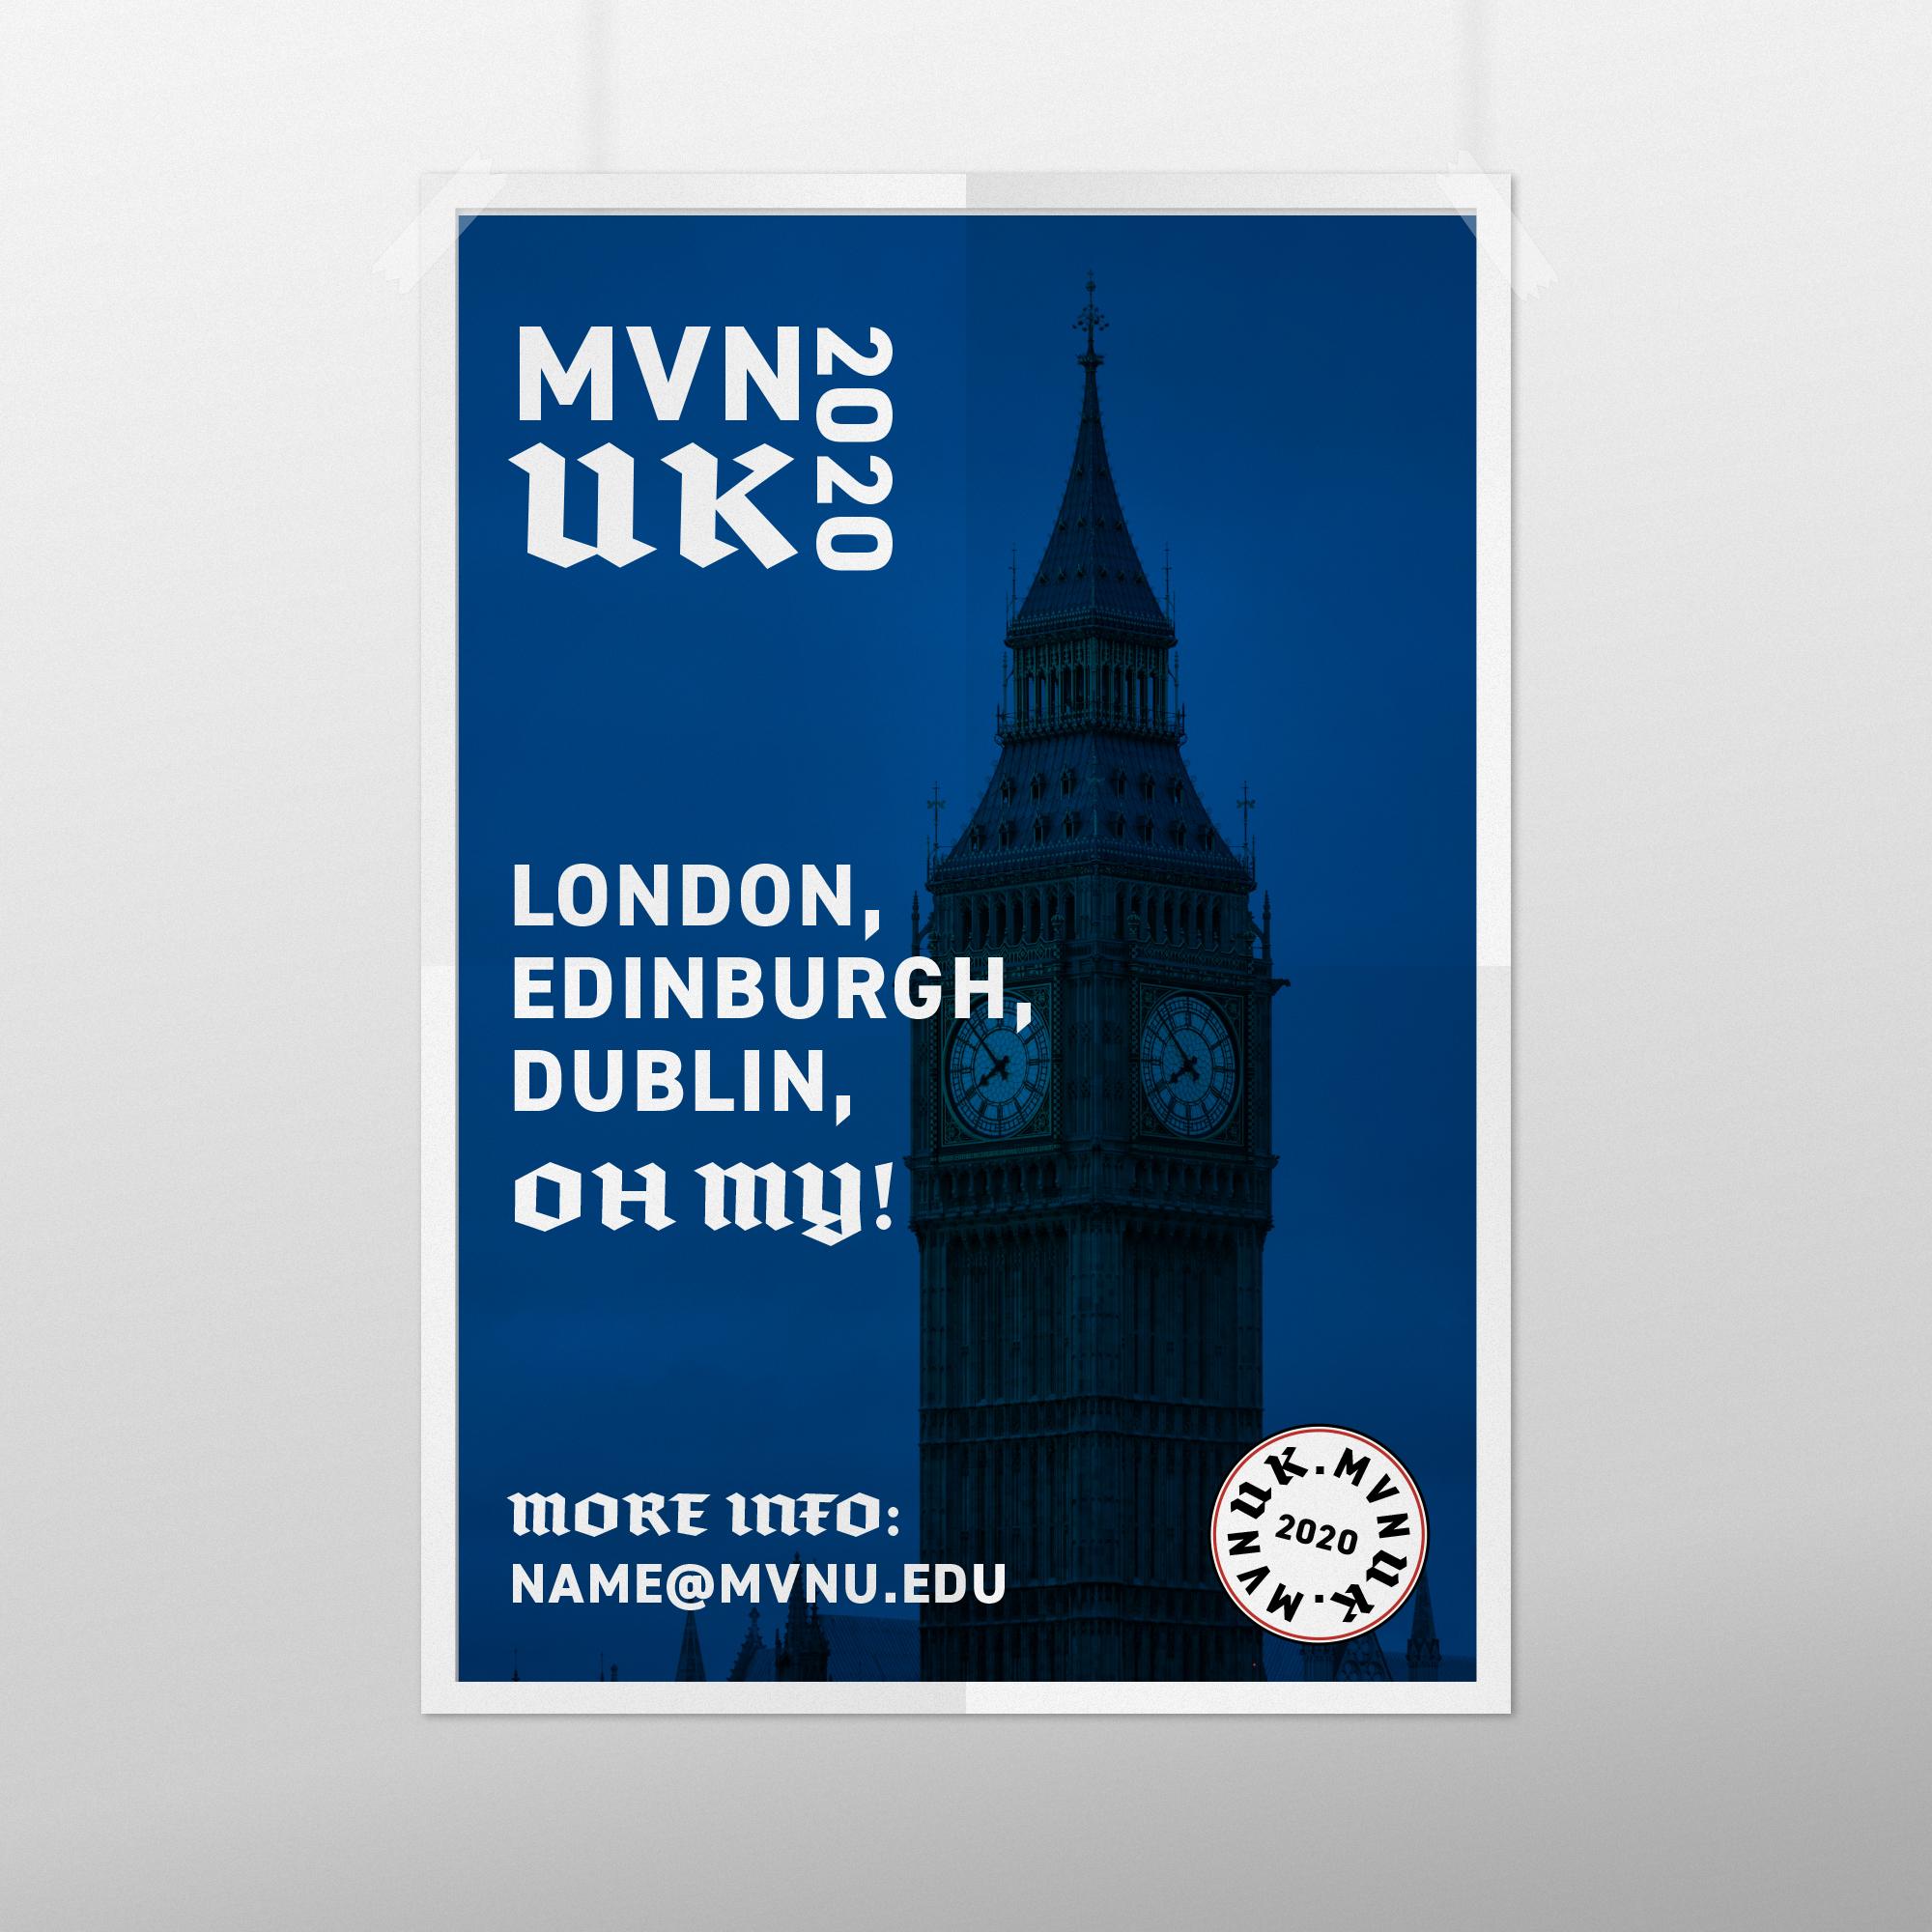 poster_mockup_v1.0_timeasley.jpg